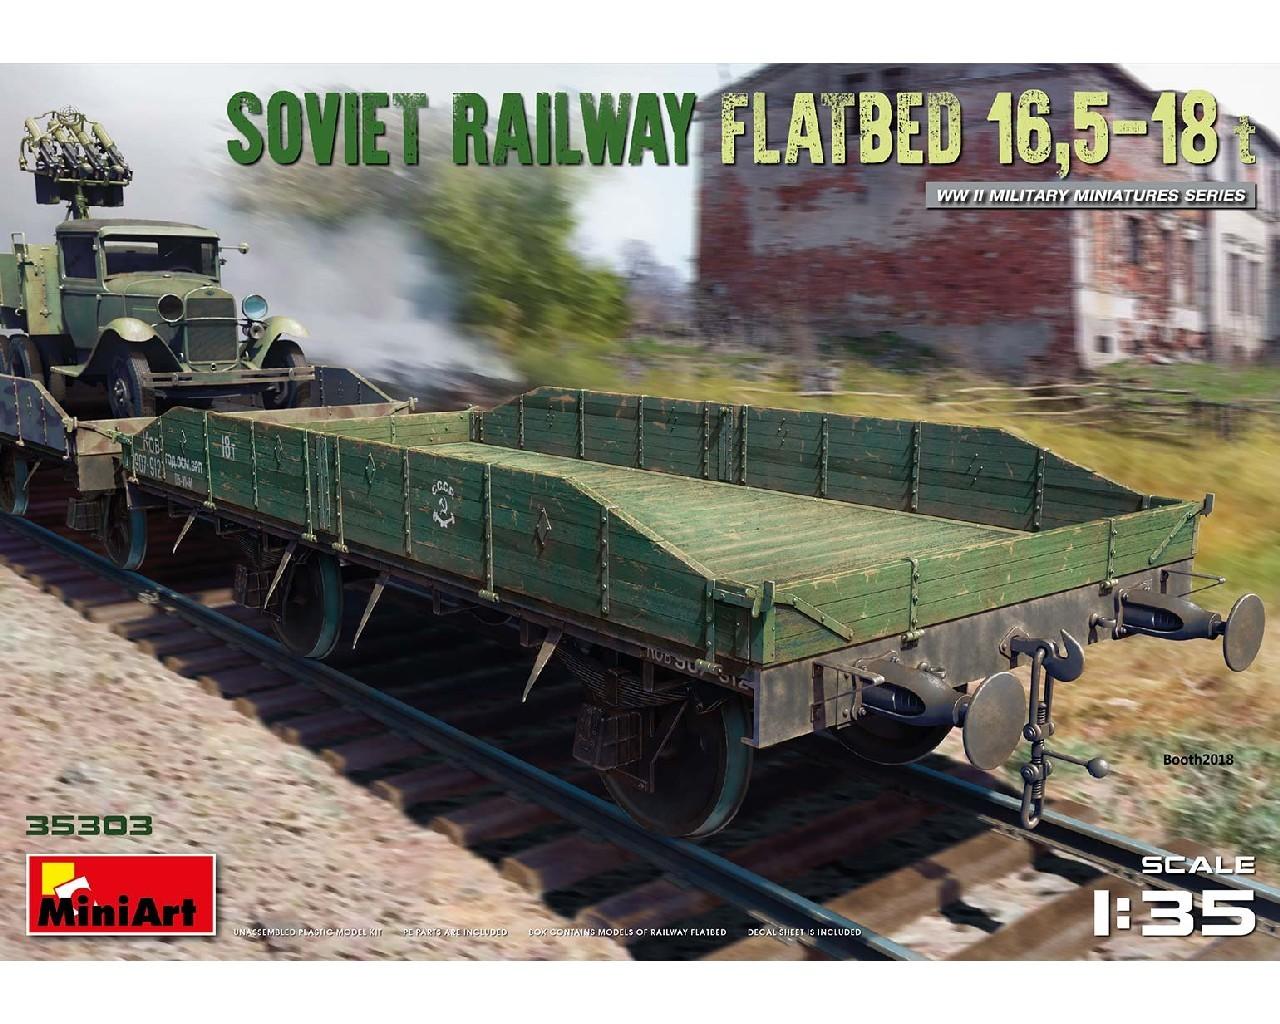 1/35 Soviet Railway Flatbed 16,5-18 t